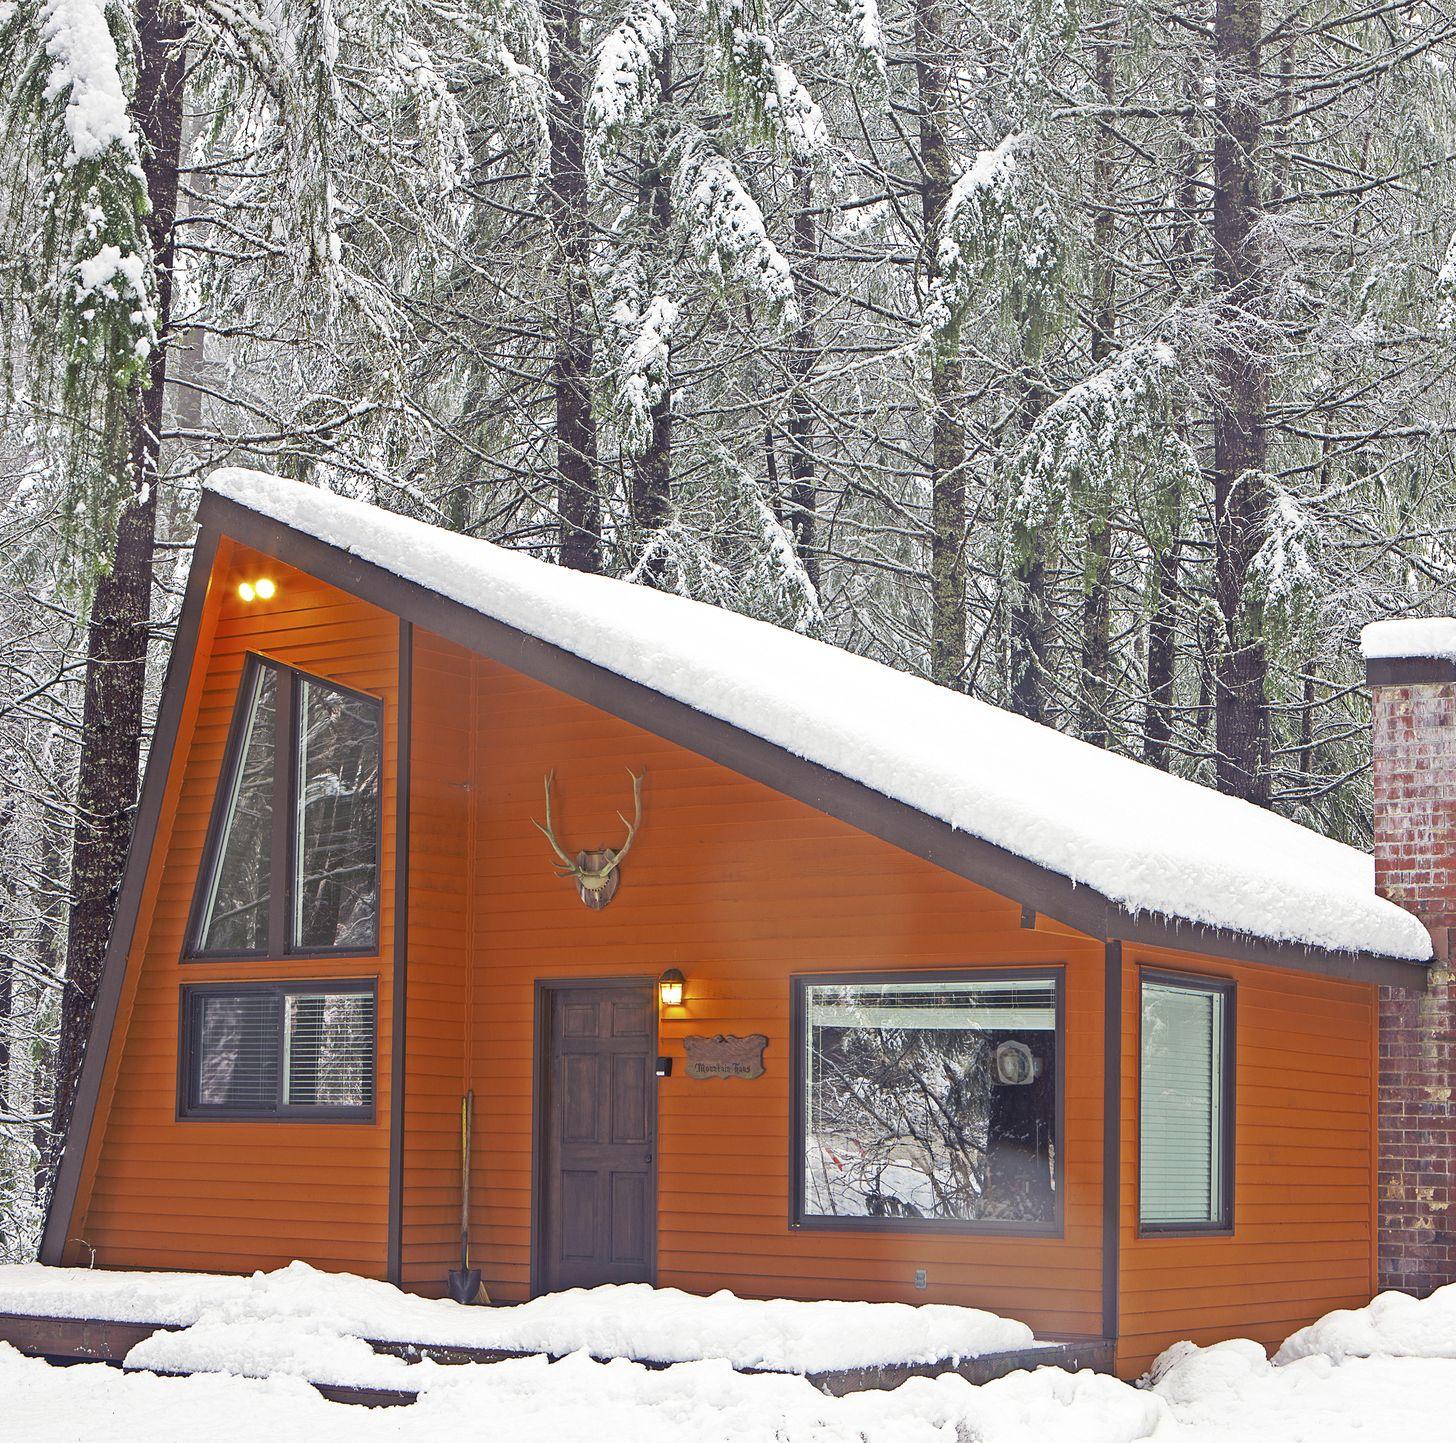 orange cabin in the woods in winter